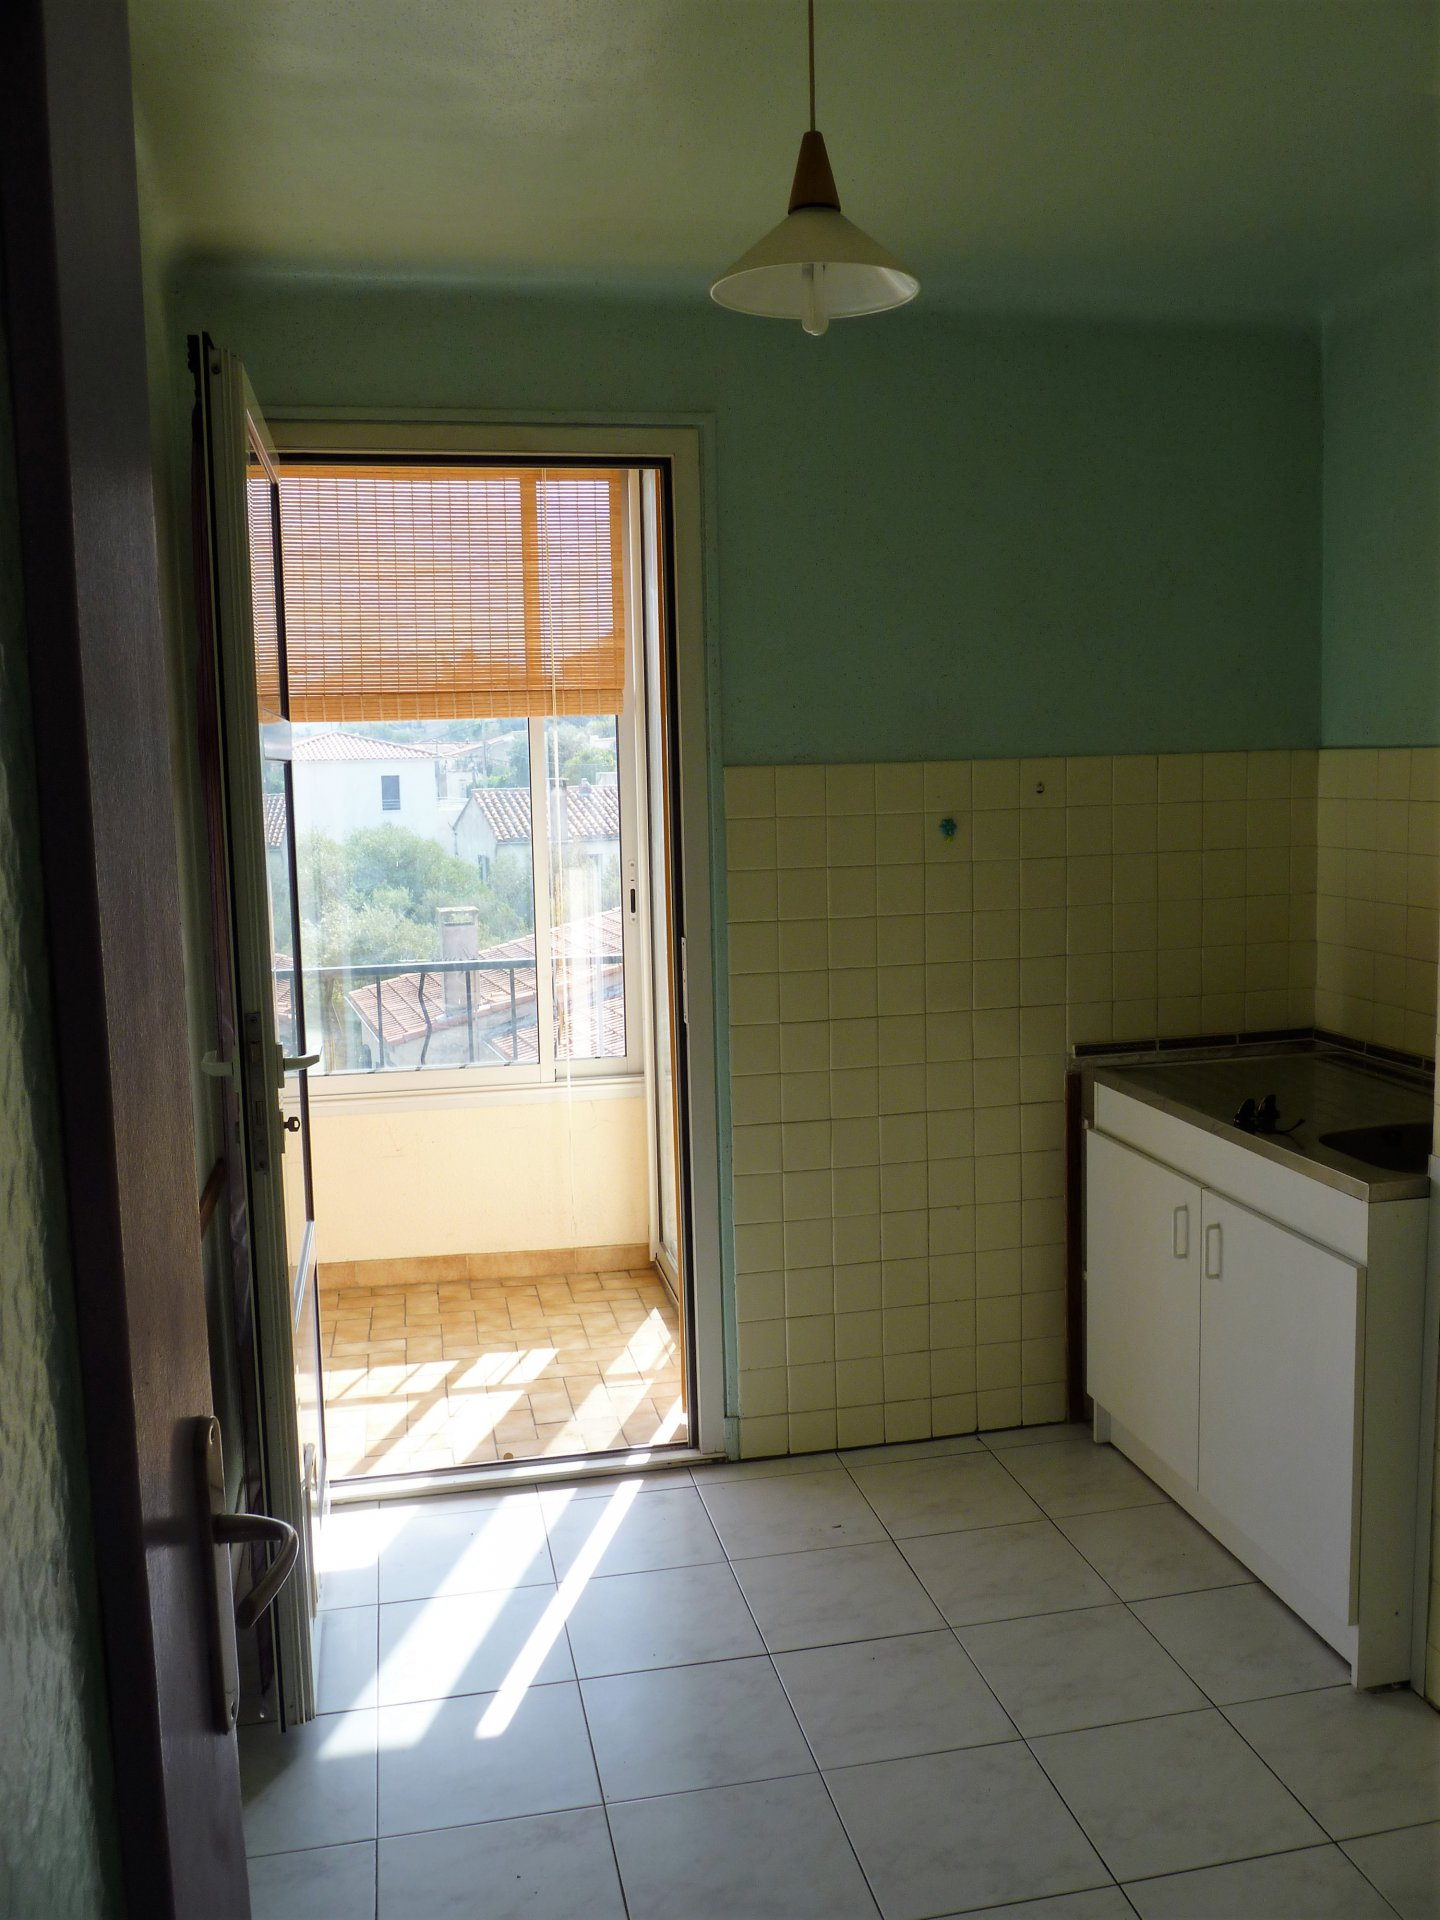 Appartement t2 le plein sud for Appartement t2